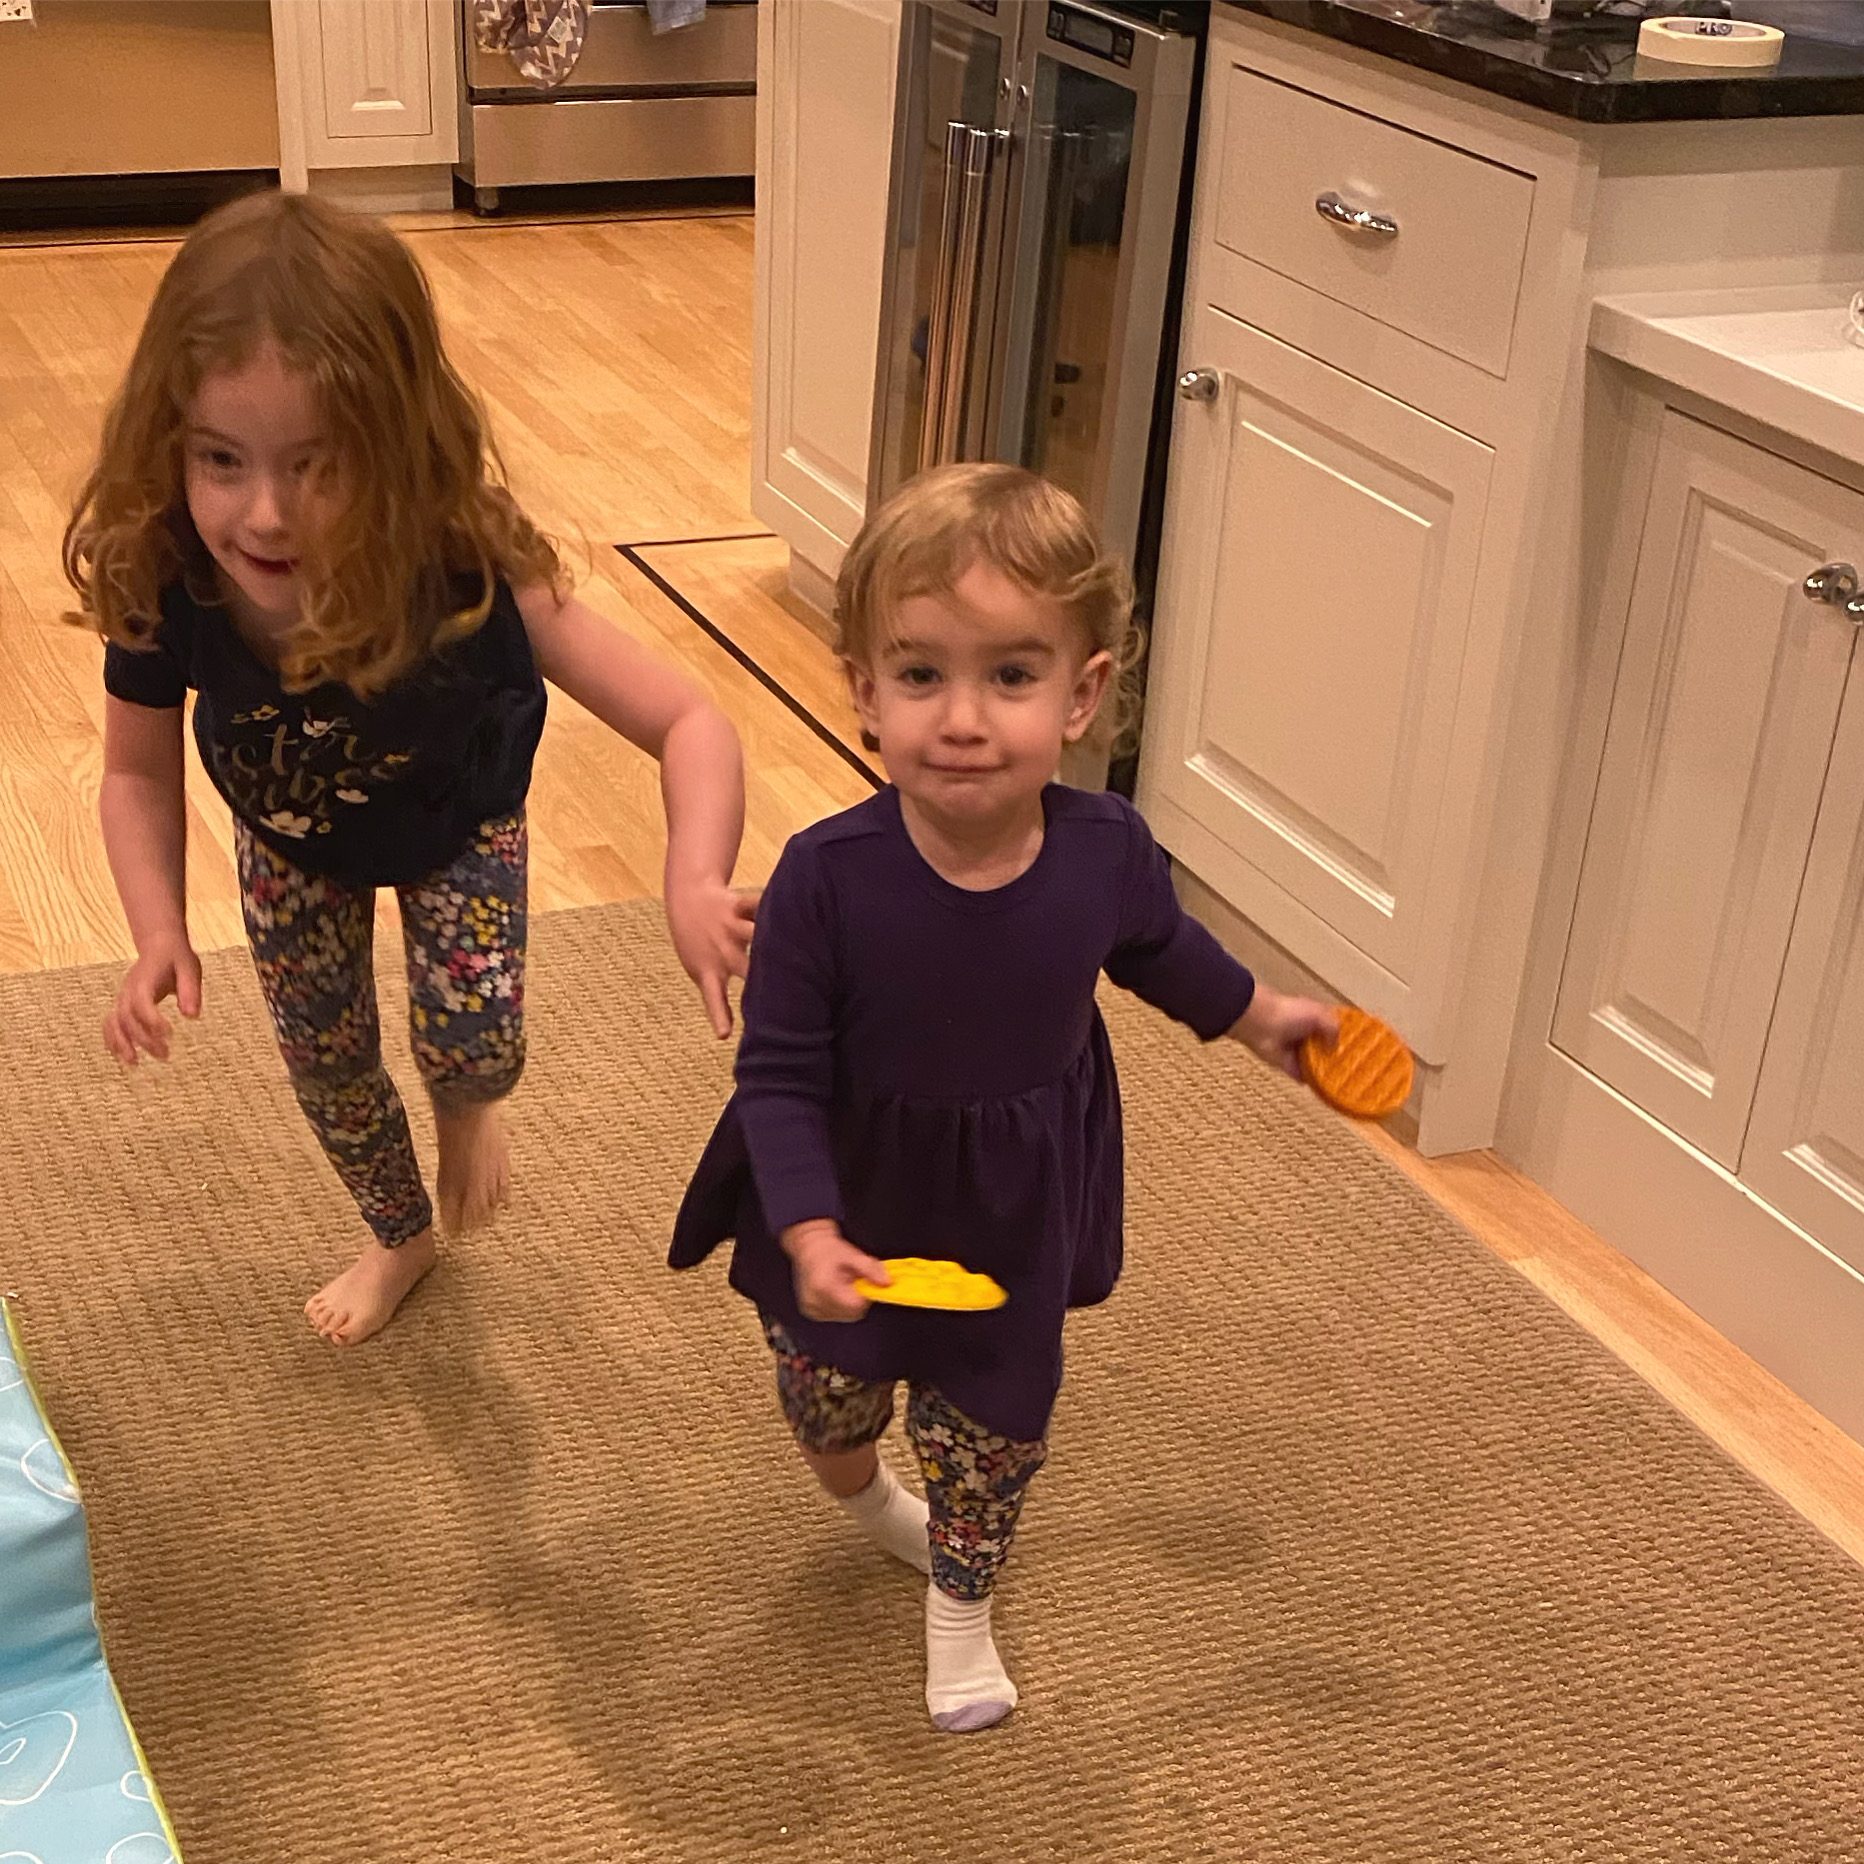 Sara Mauskopf's two daughters run toward the camera through their home's kitchen